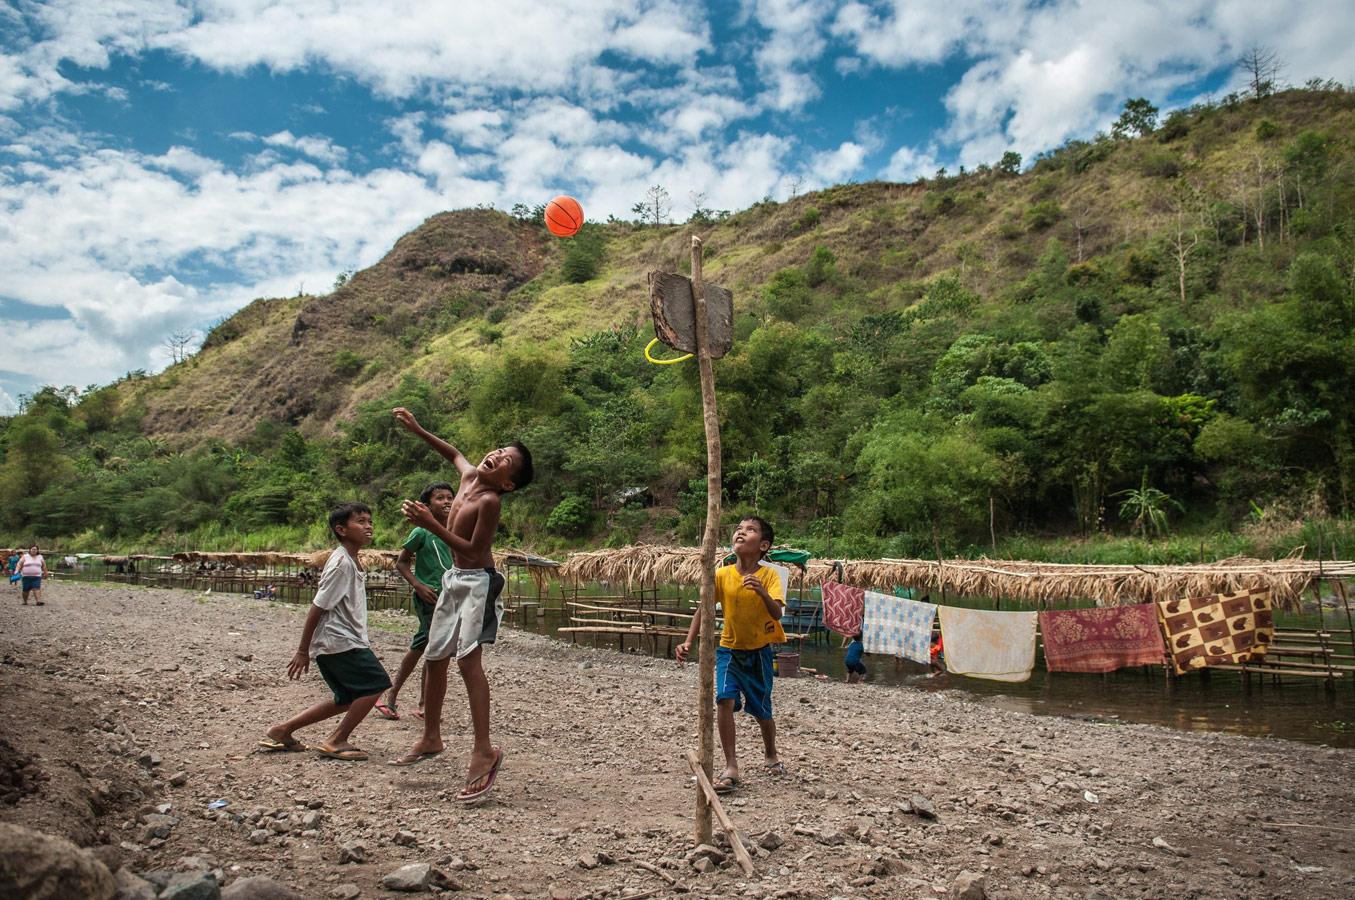 © Robert Alvarez Jr., FIBA Photo Contest